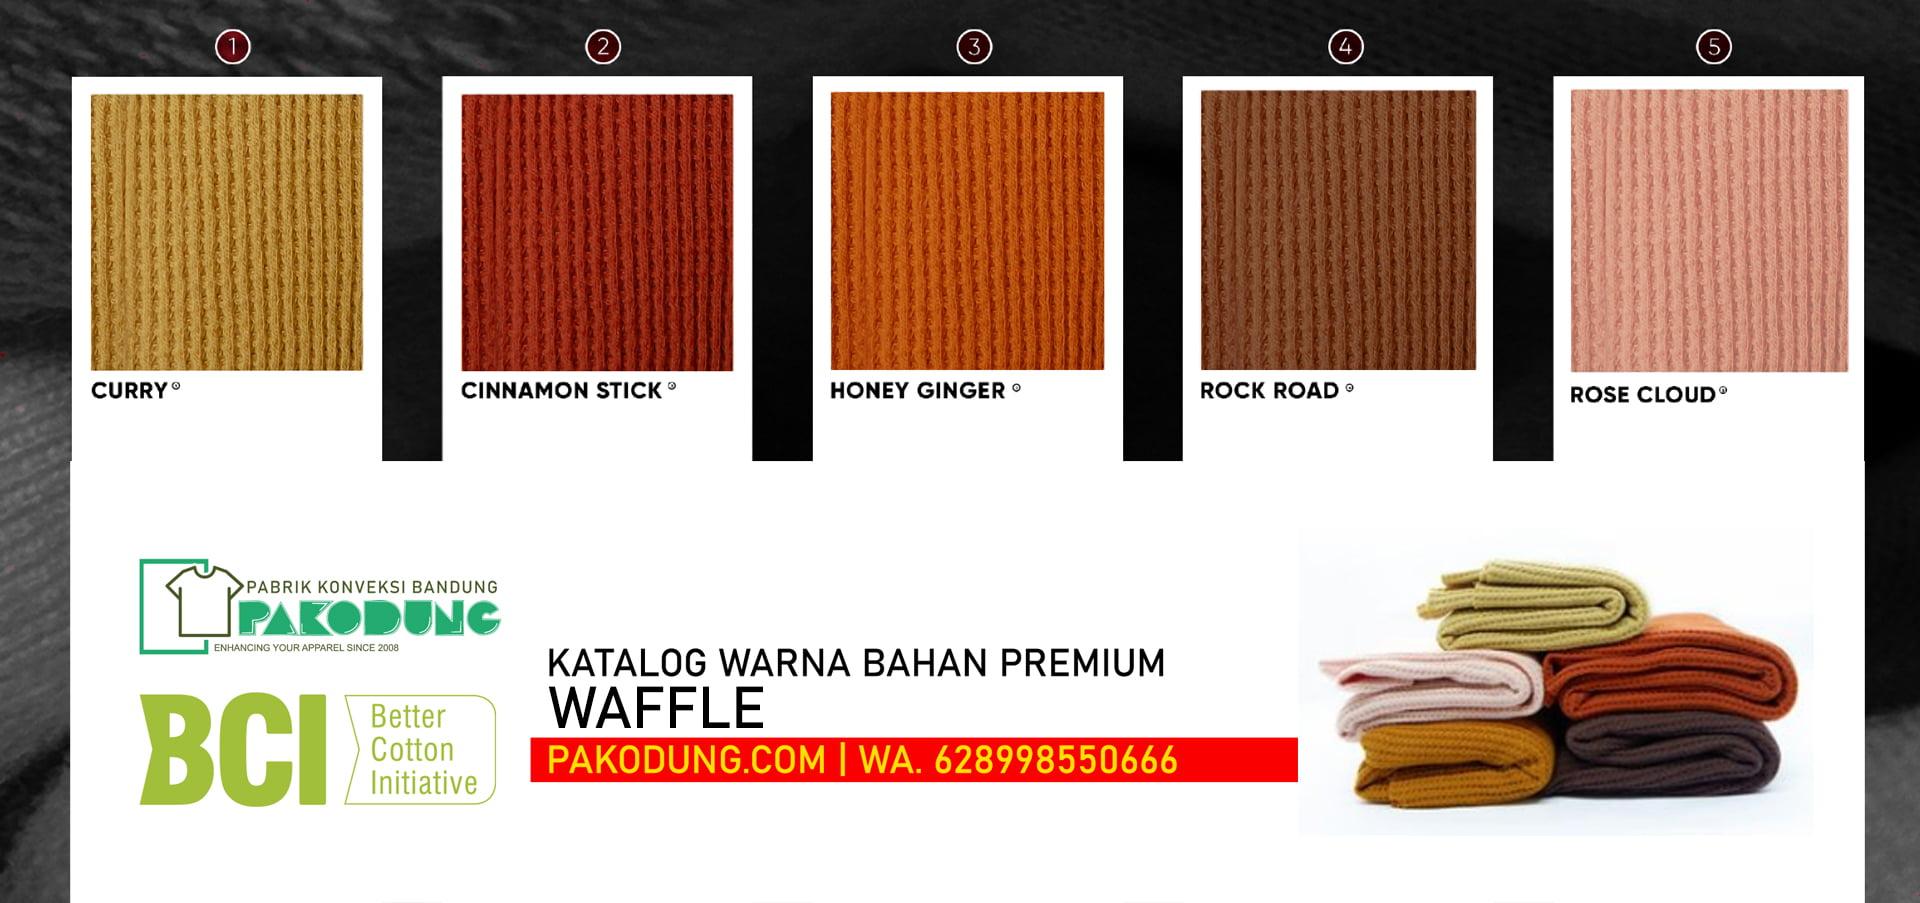 katalog warna bahan kain waffle